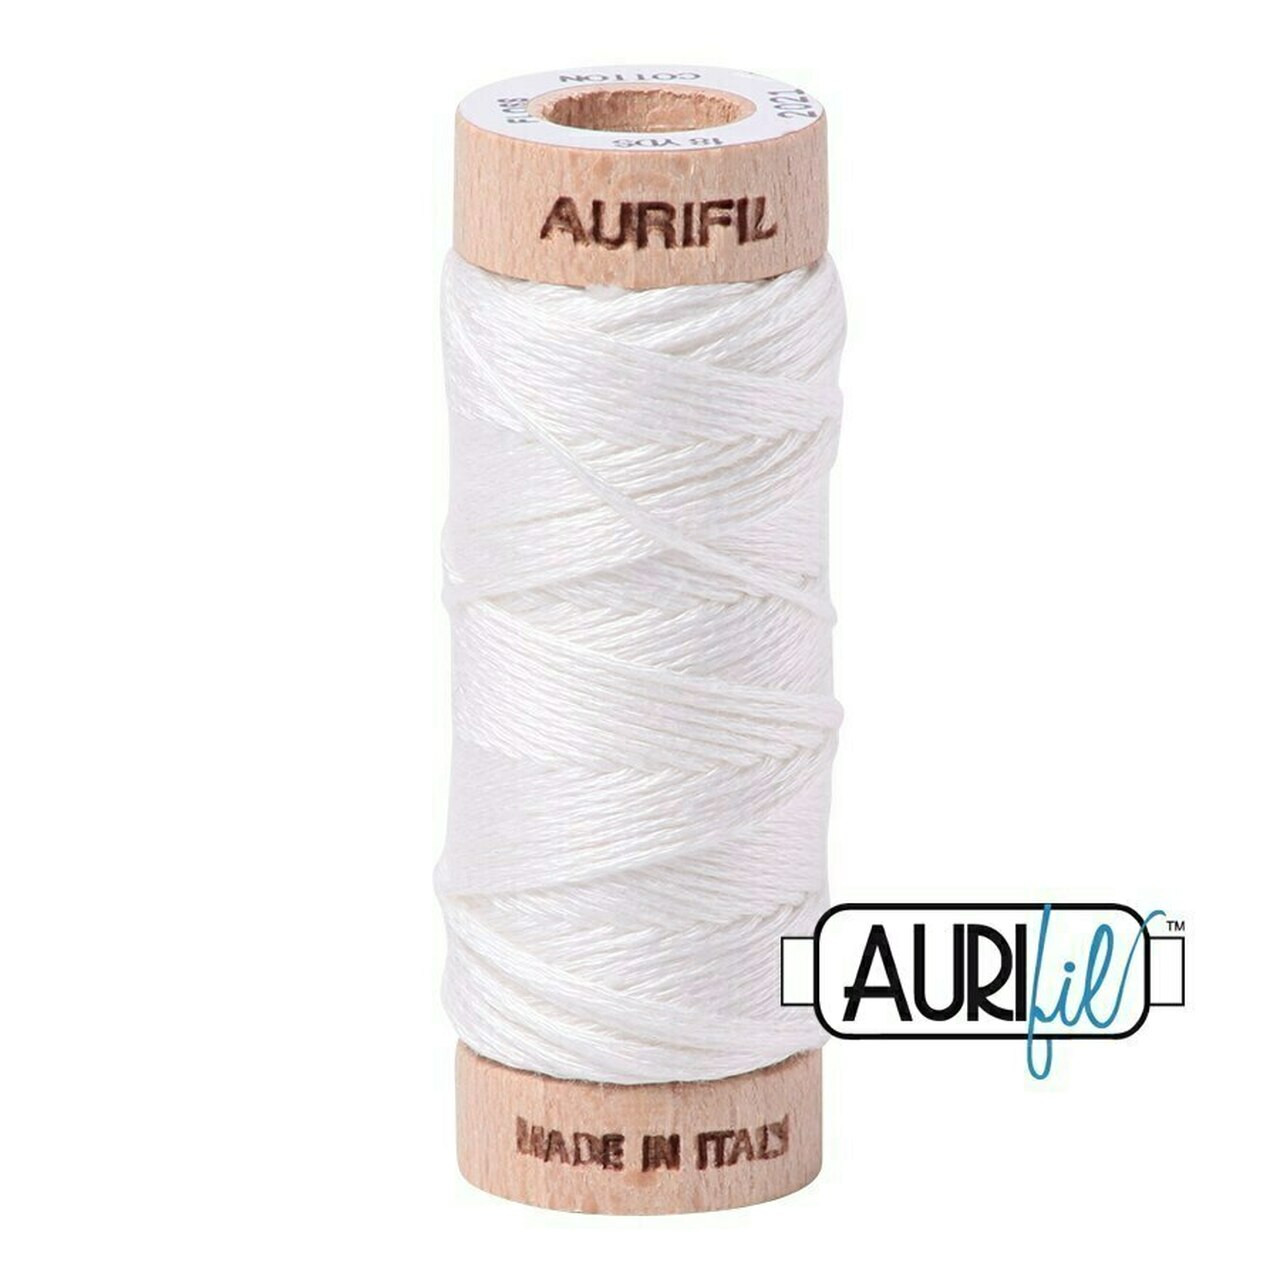 Aurifil 2021 - Natural White